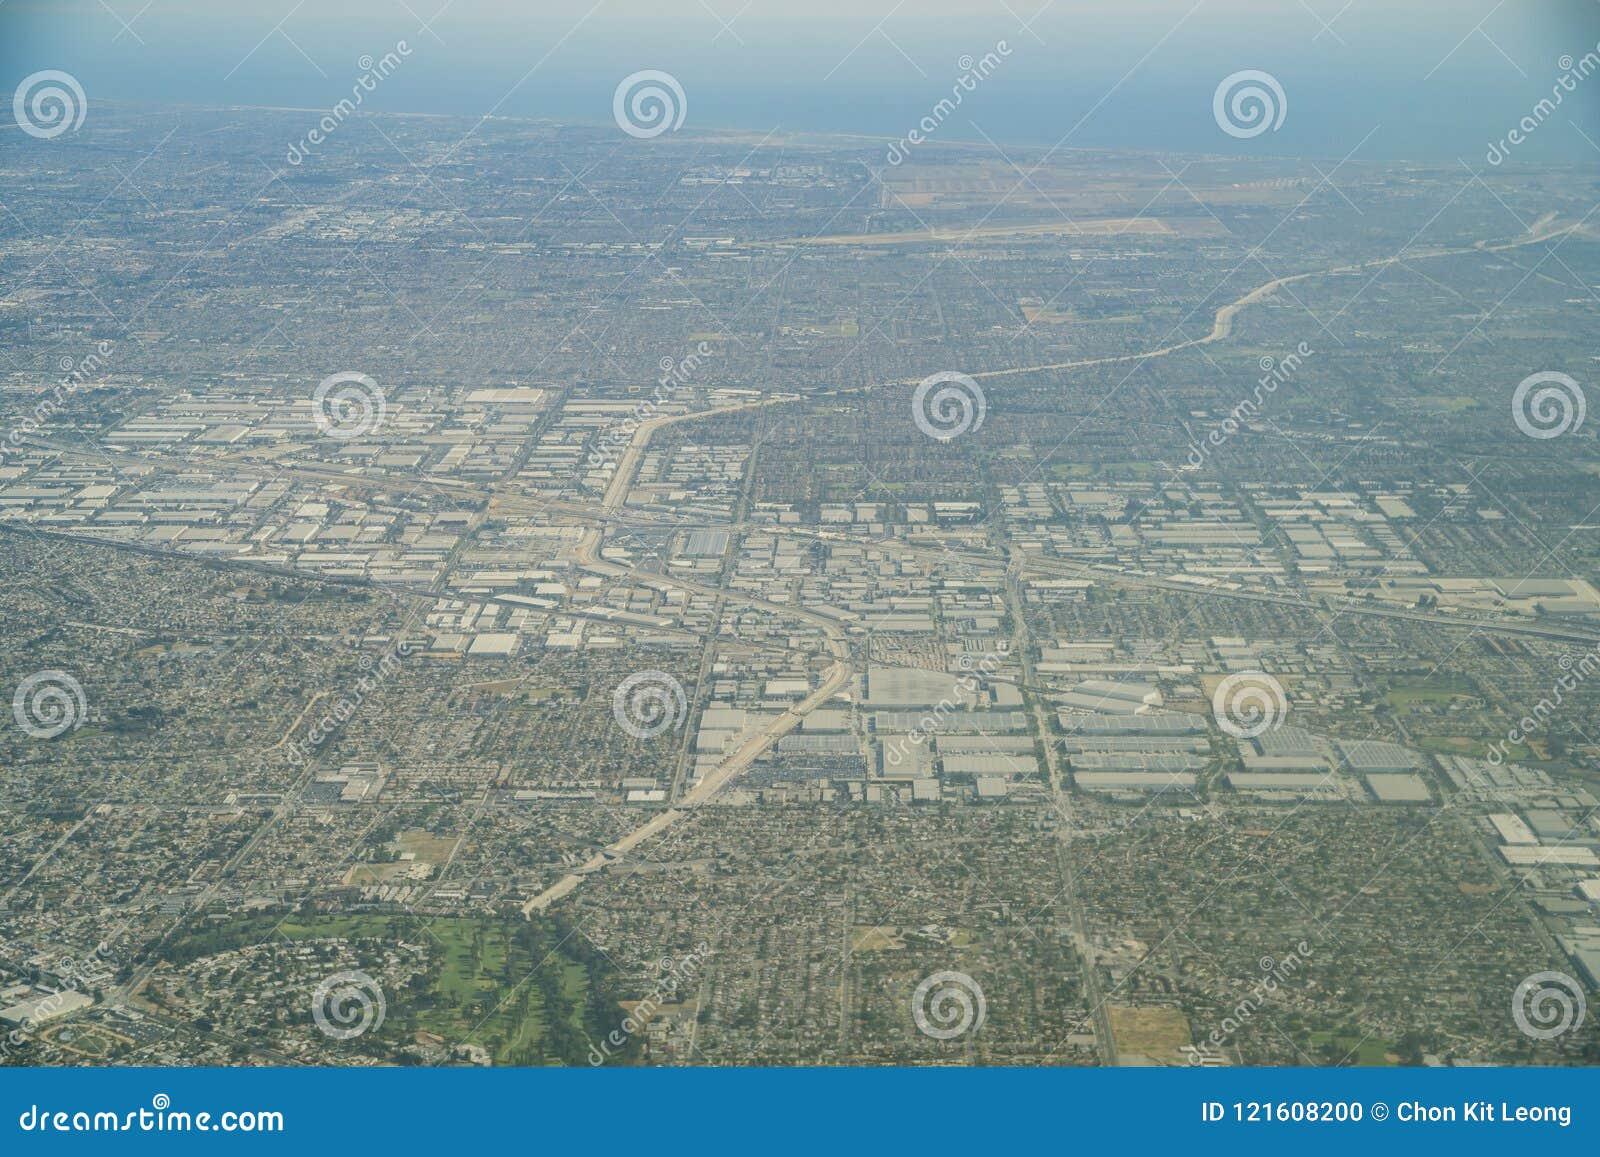 Aerial view of the Buena Park, Cerritos